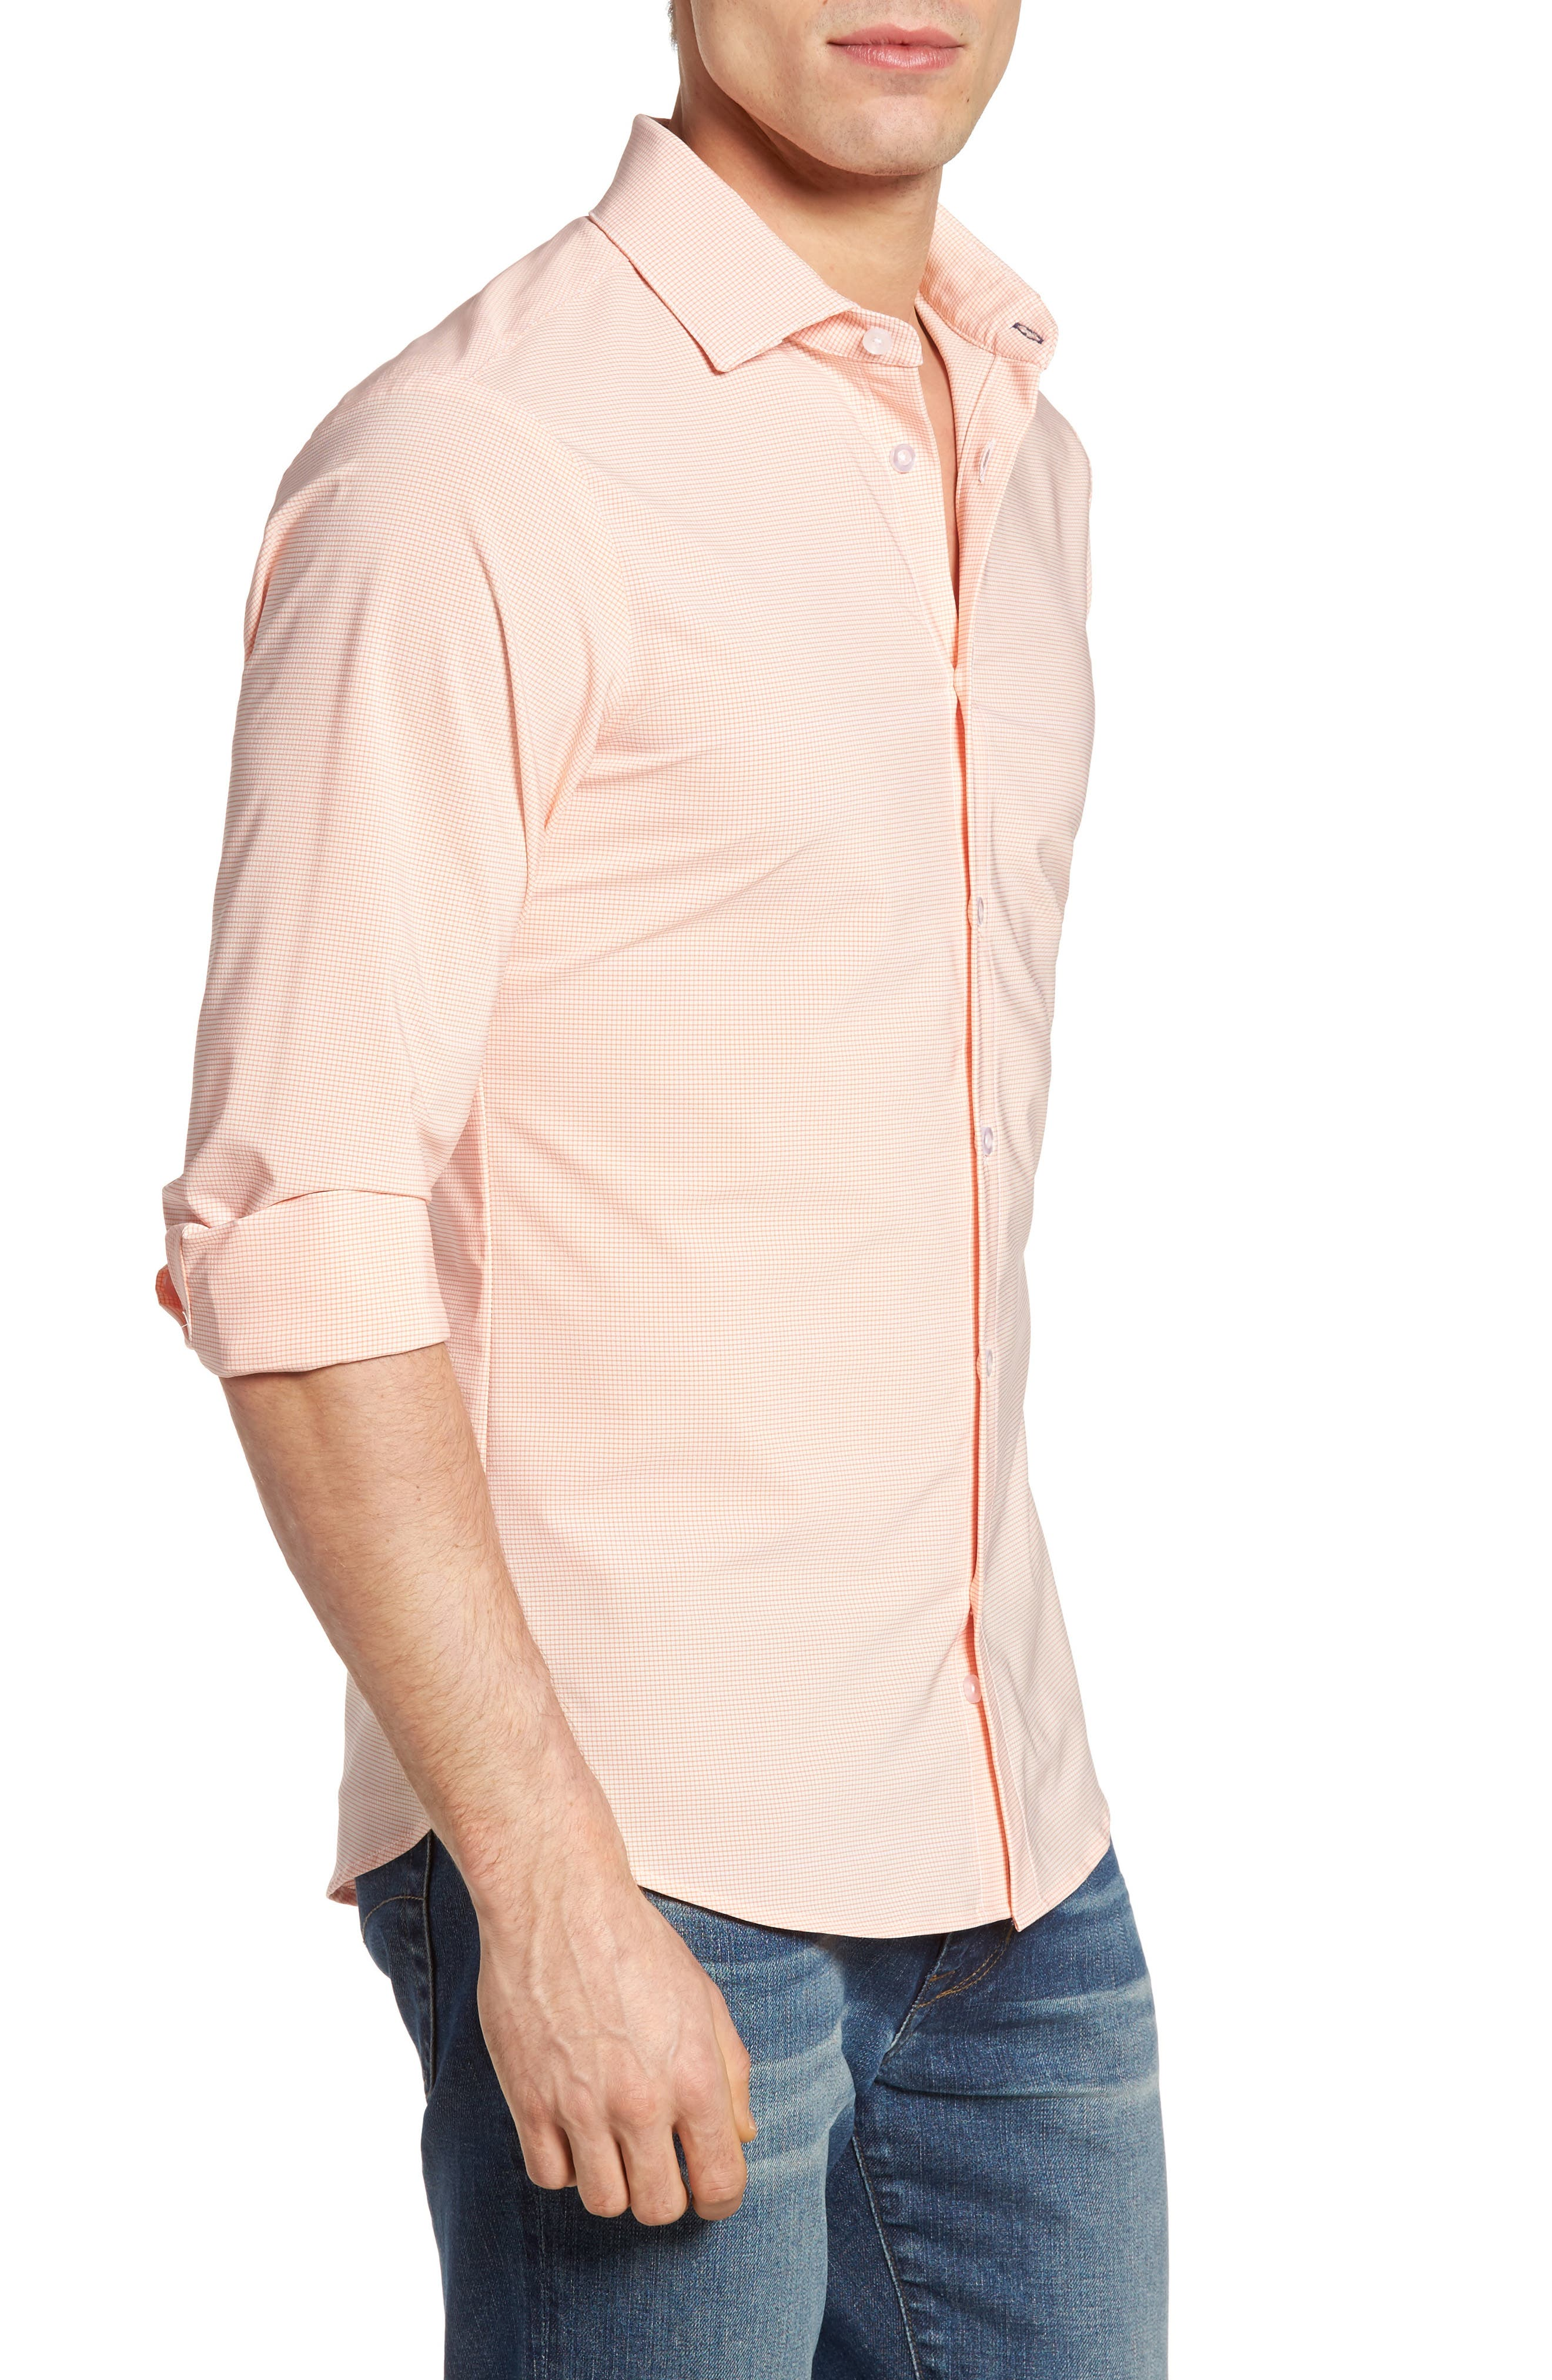 Charles Microcheck Performance Sport Shirt,                             Alternate thumbnail 3, color,                             Peach